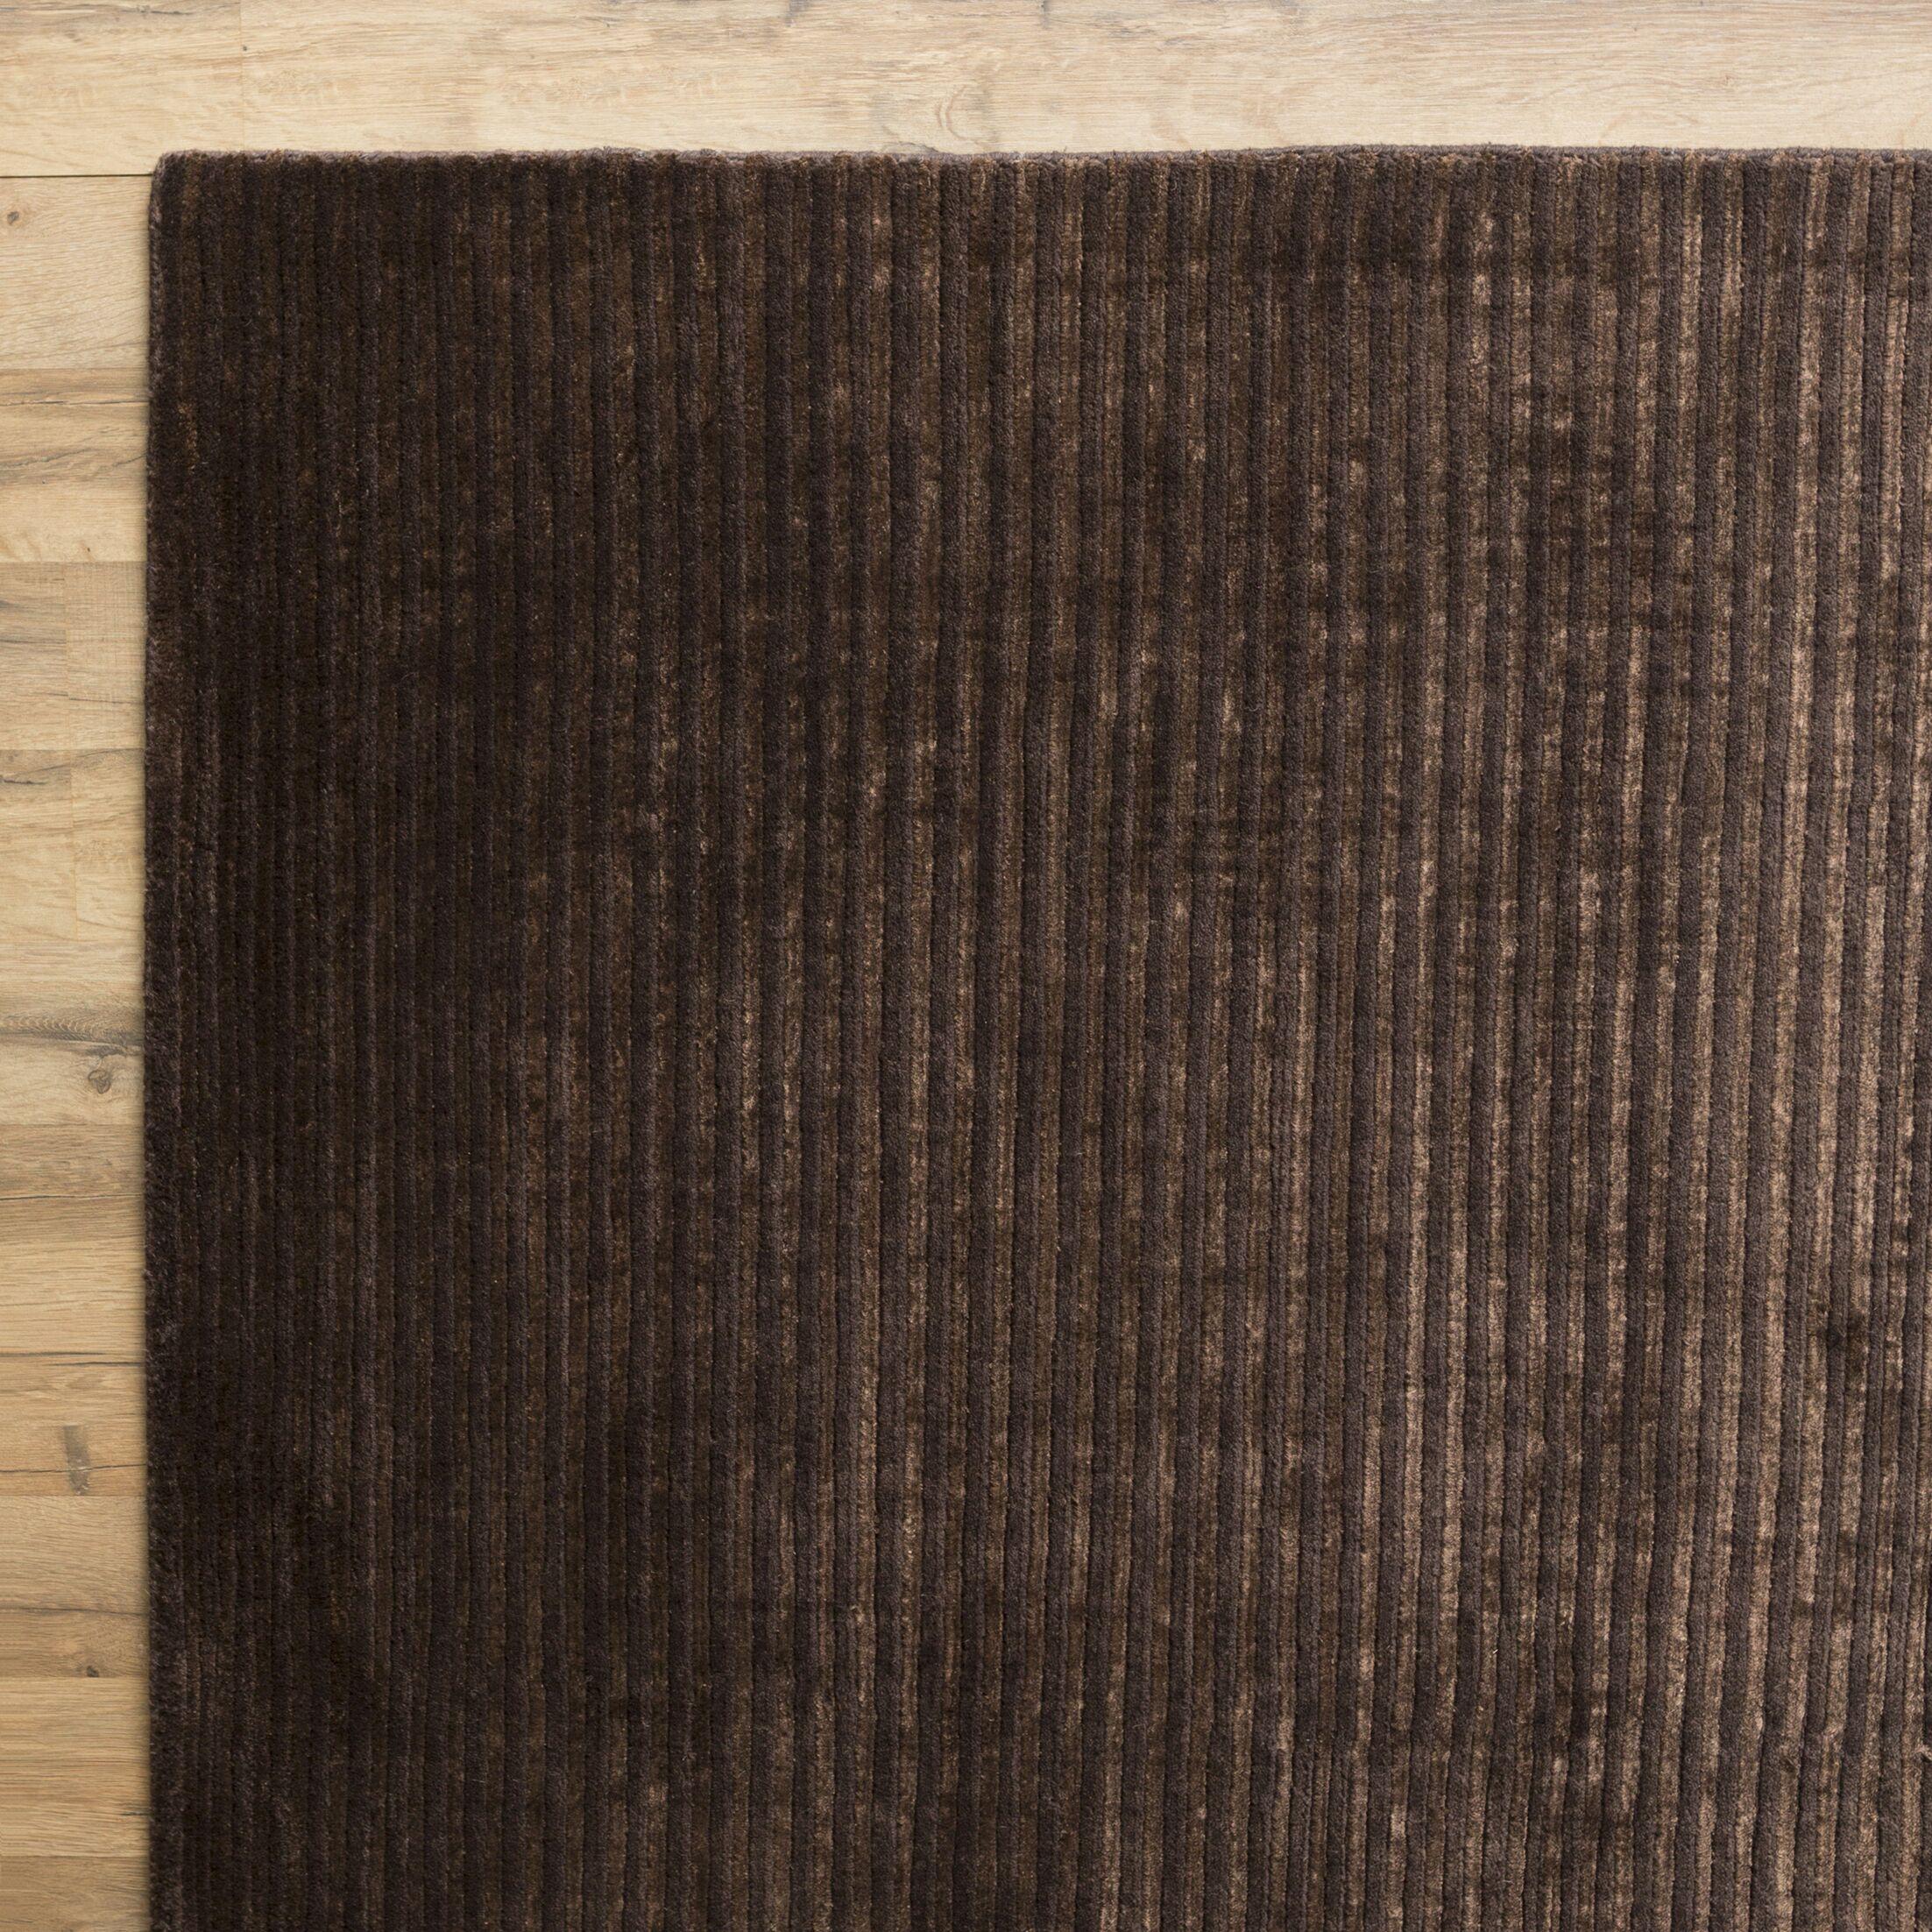 Jade Mocha Rug Rug Size: Rectangle 5' x 8'